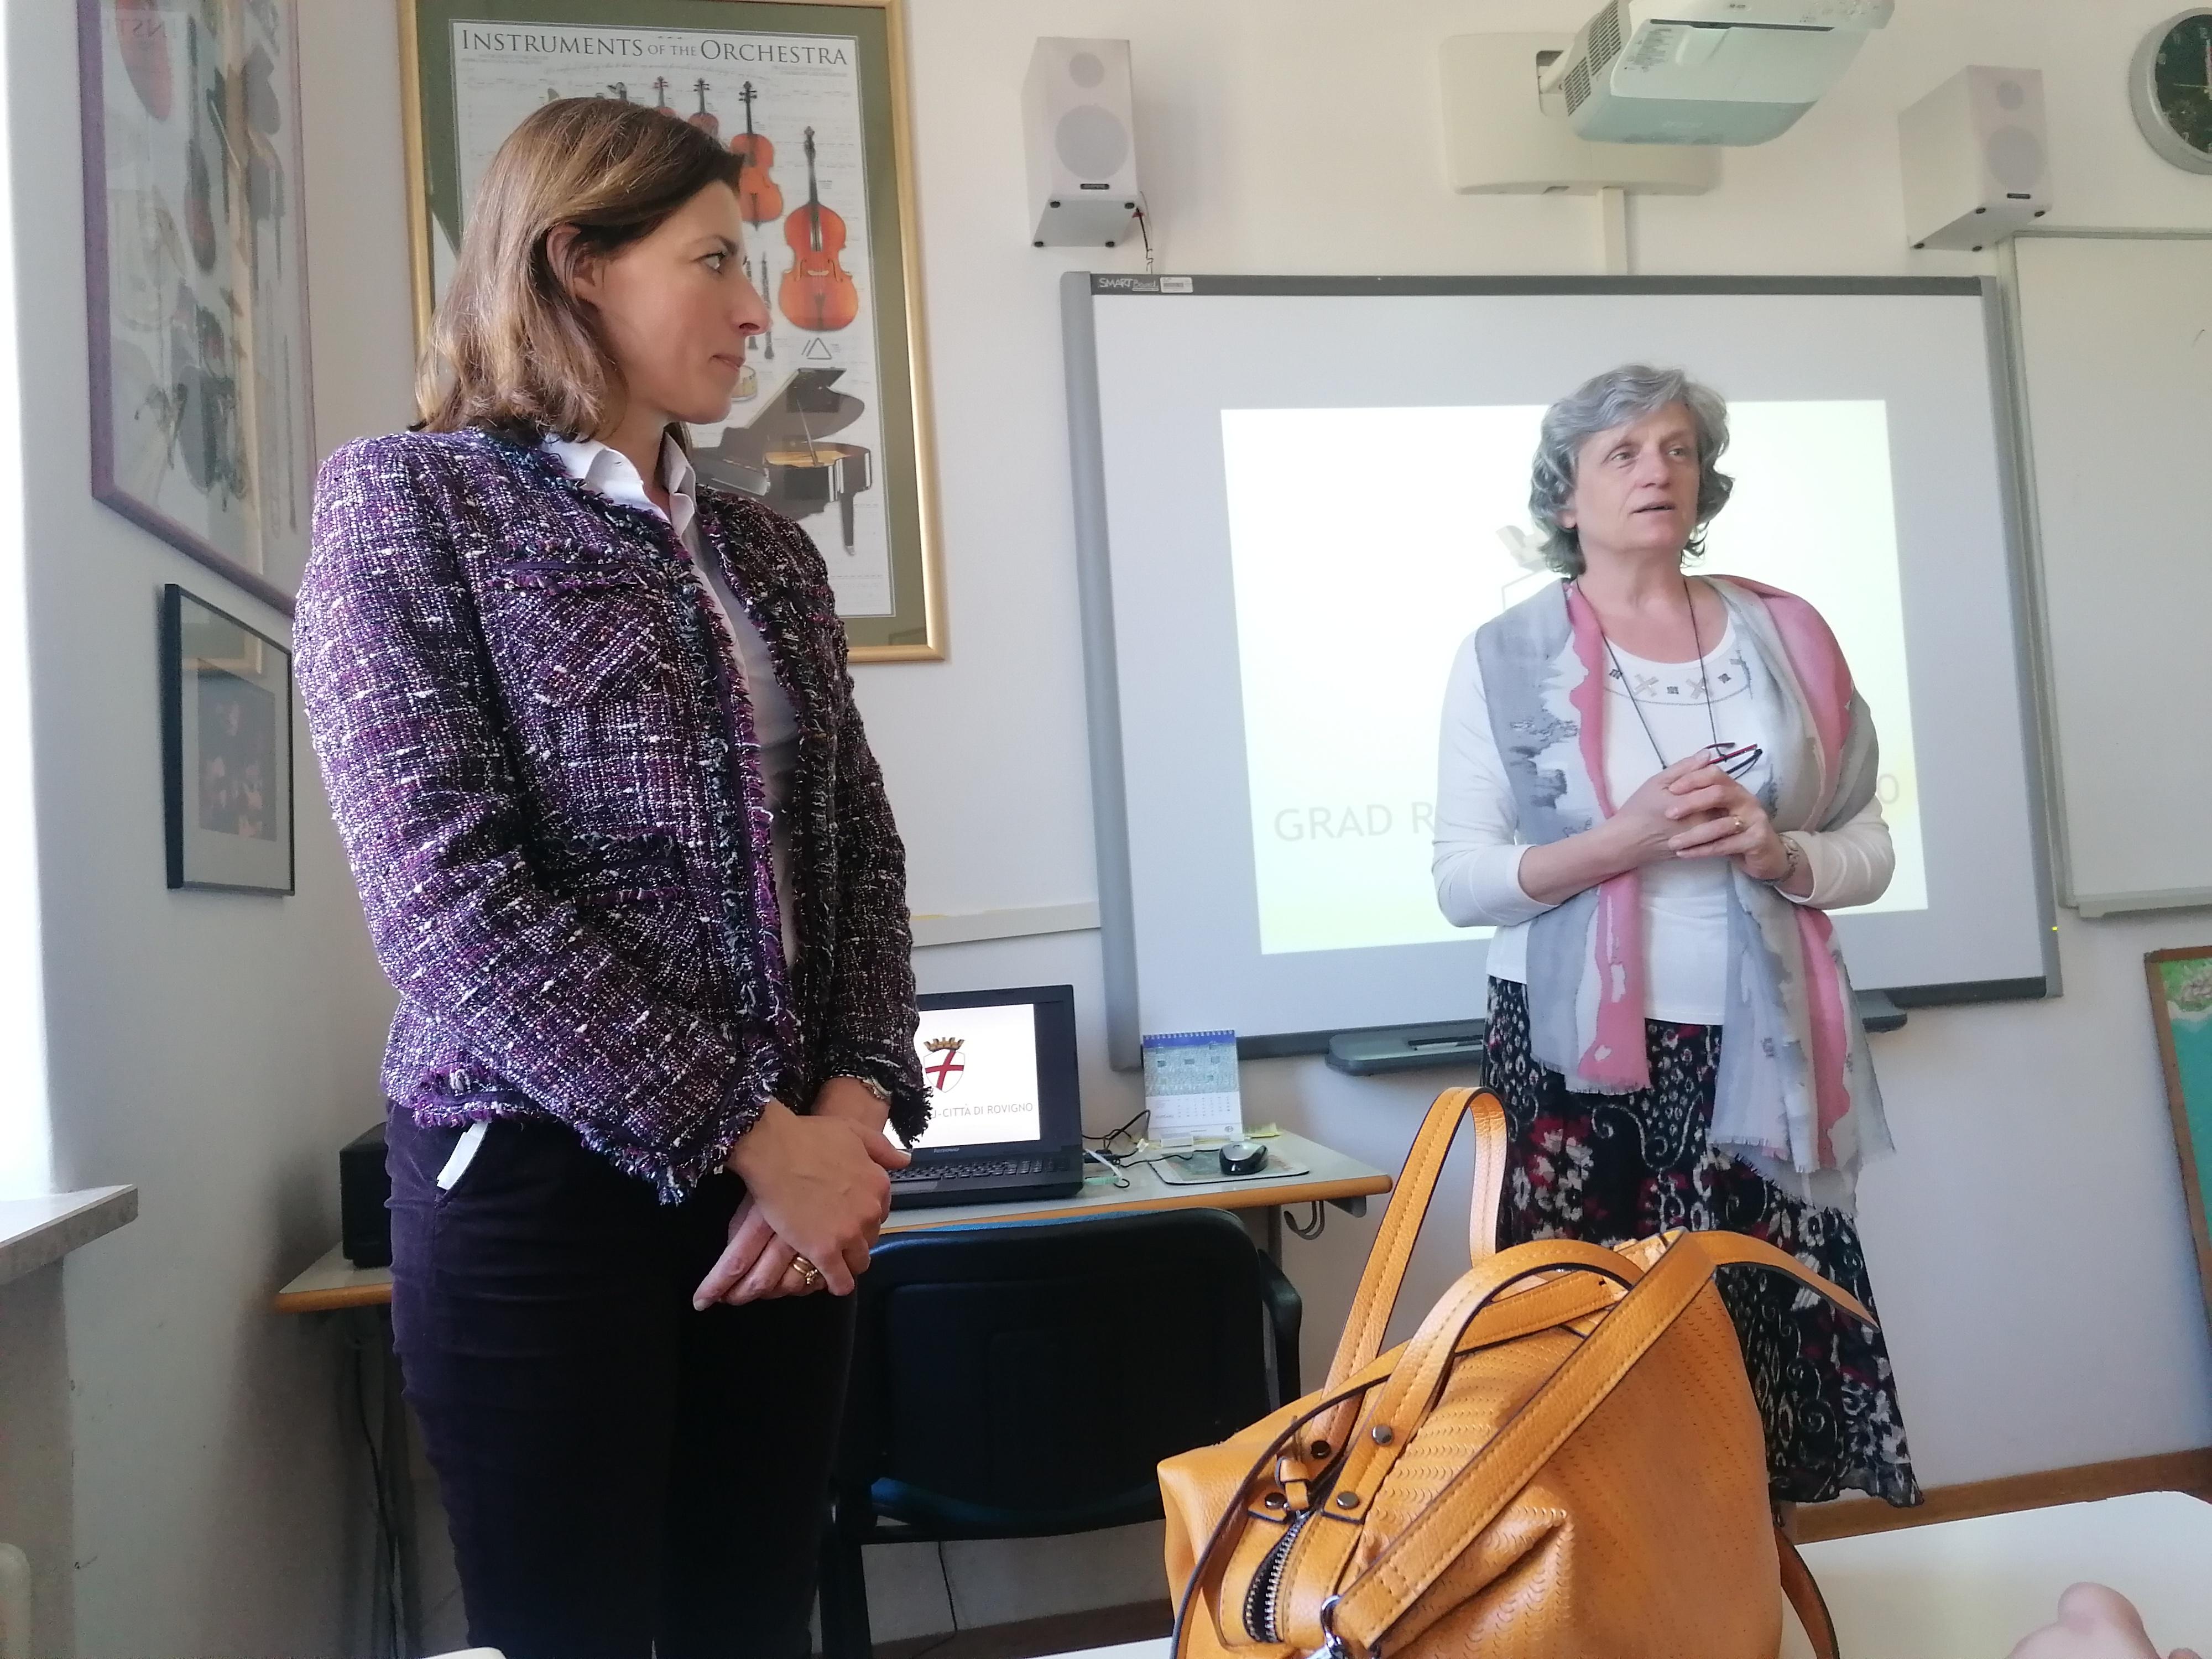 Učenici Talijanske srednje škole pobliže upoznali rad Gradske uprave